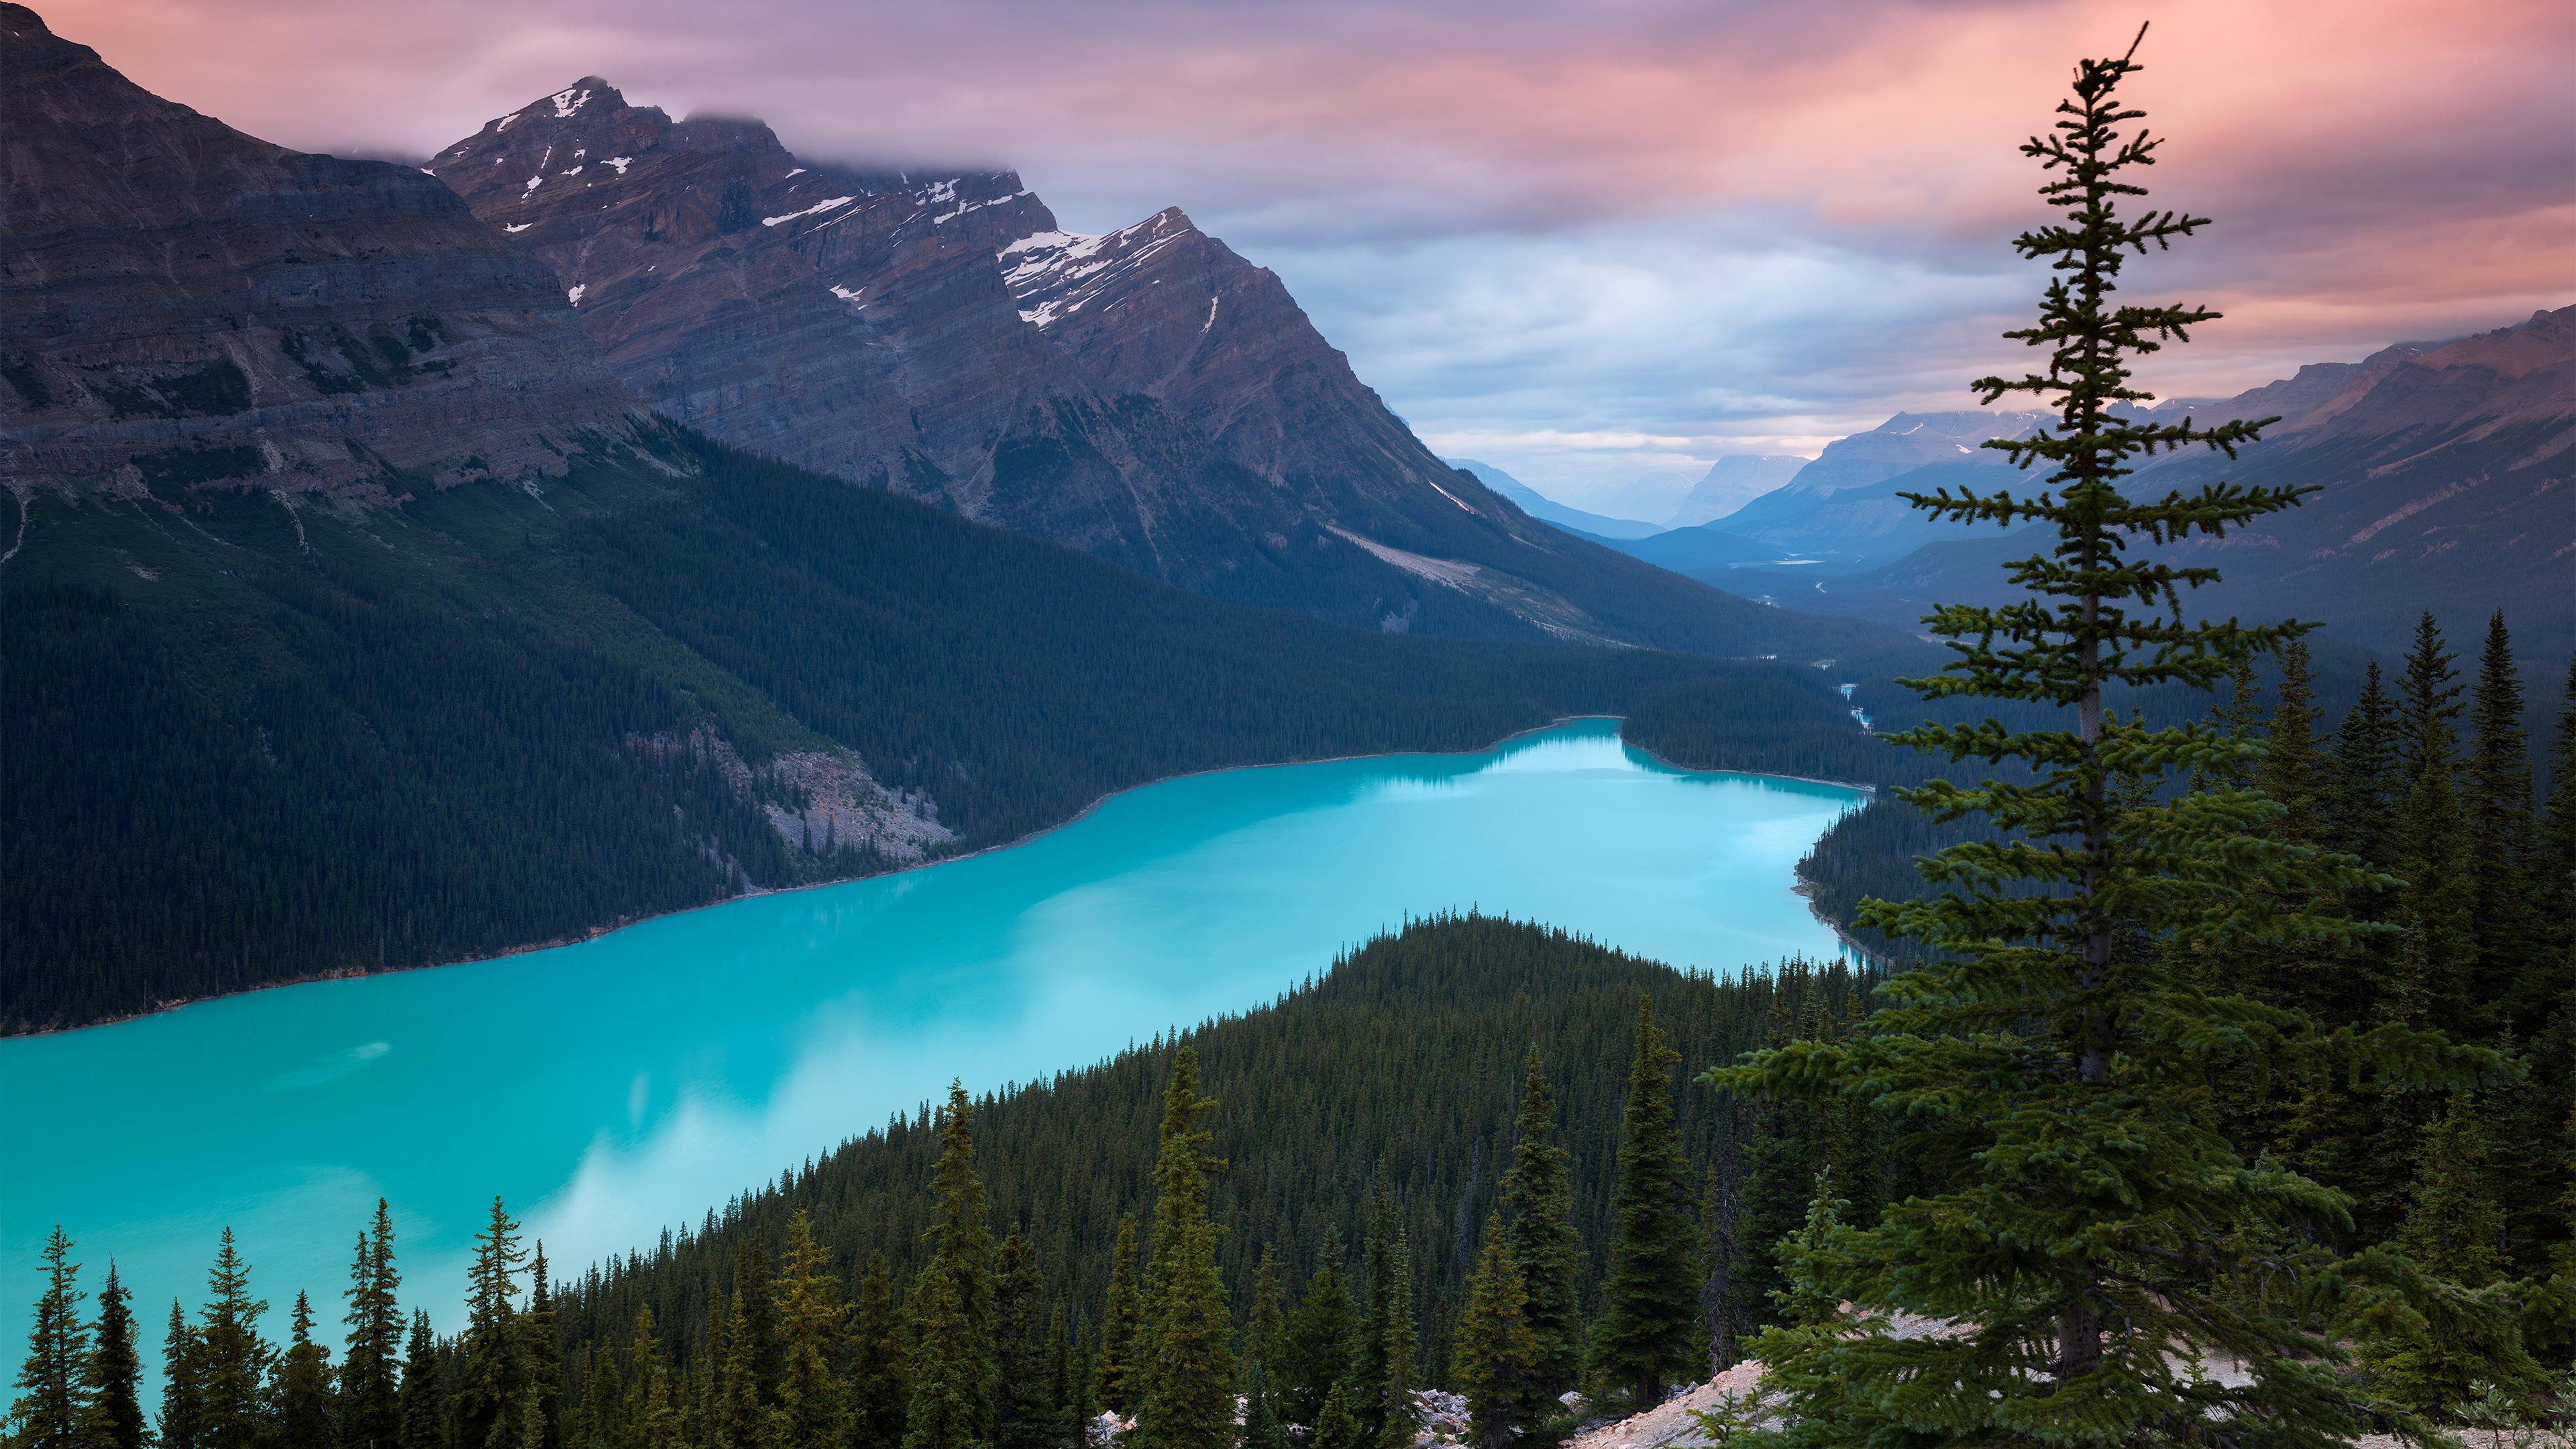 Peyto Lake Canada Mountains 4k, HD Nature, 4k Wallpapers ...